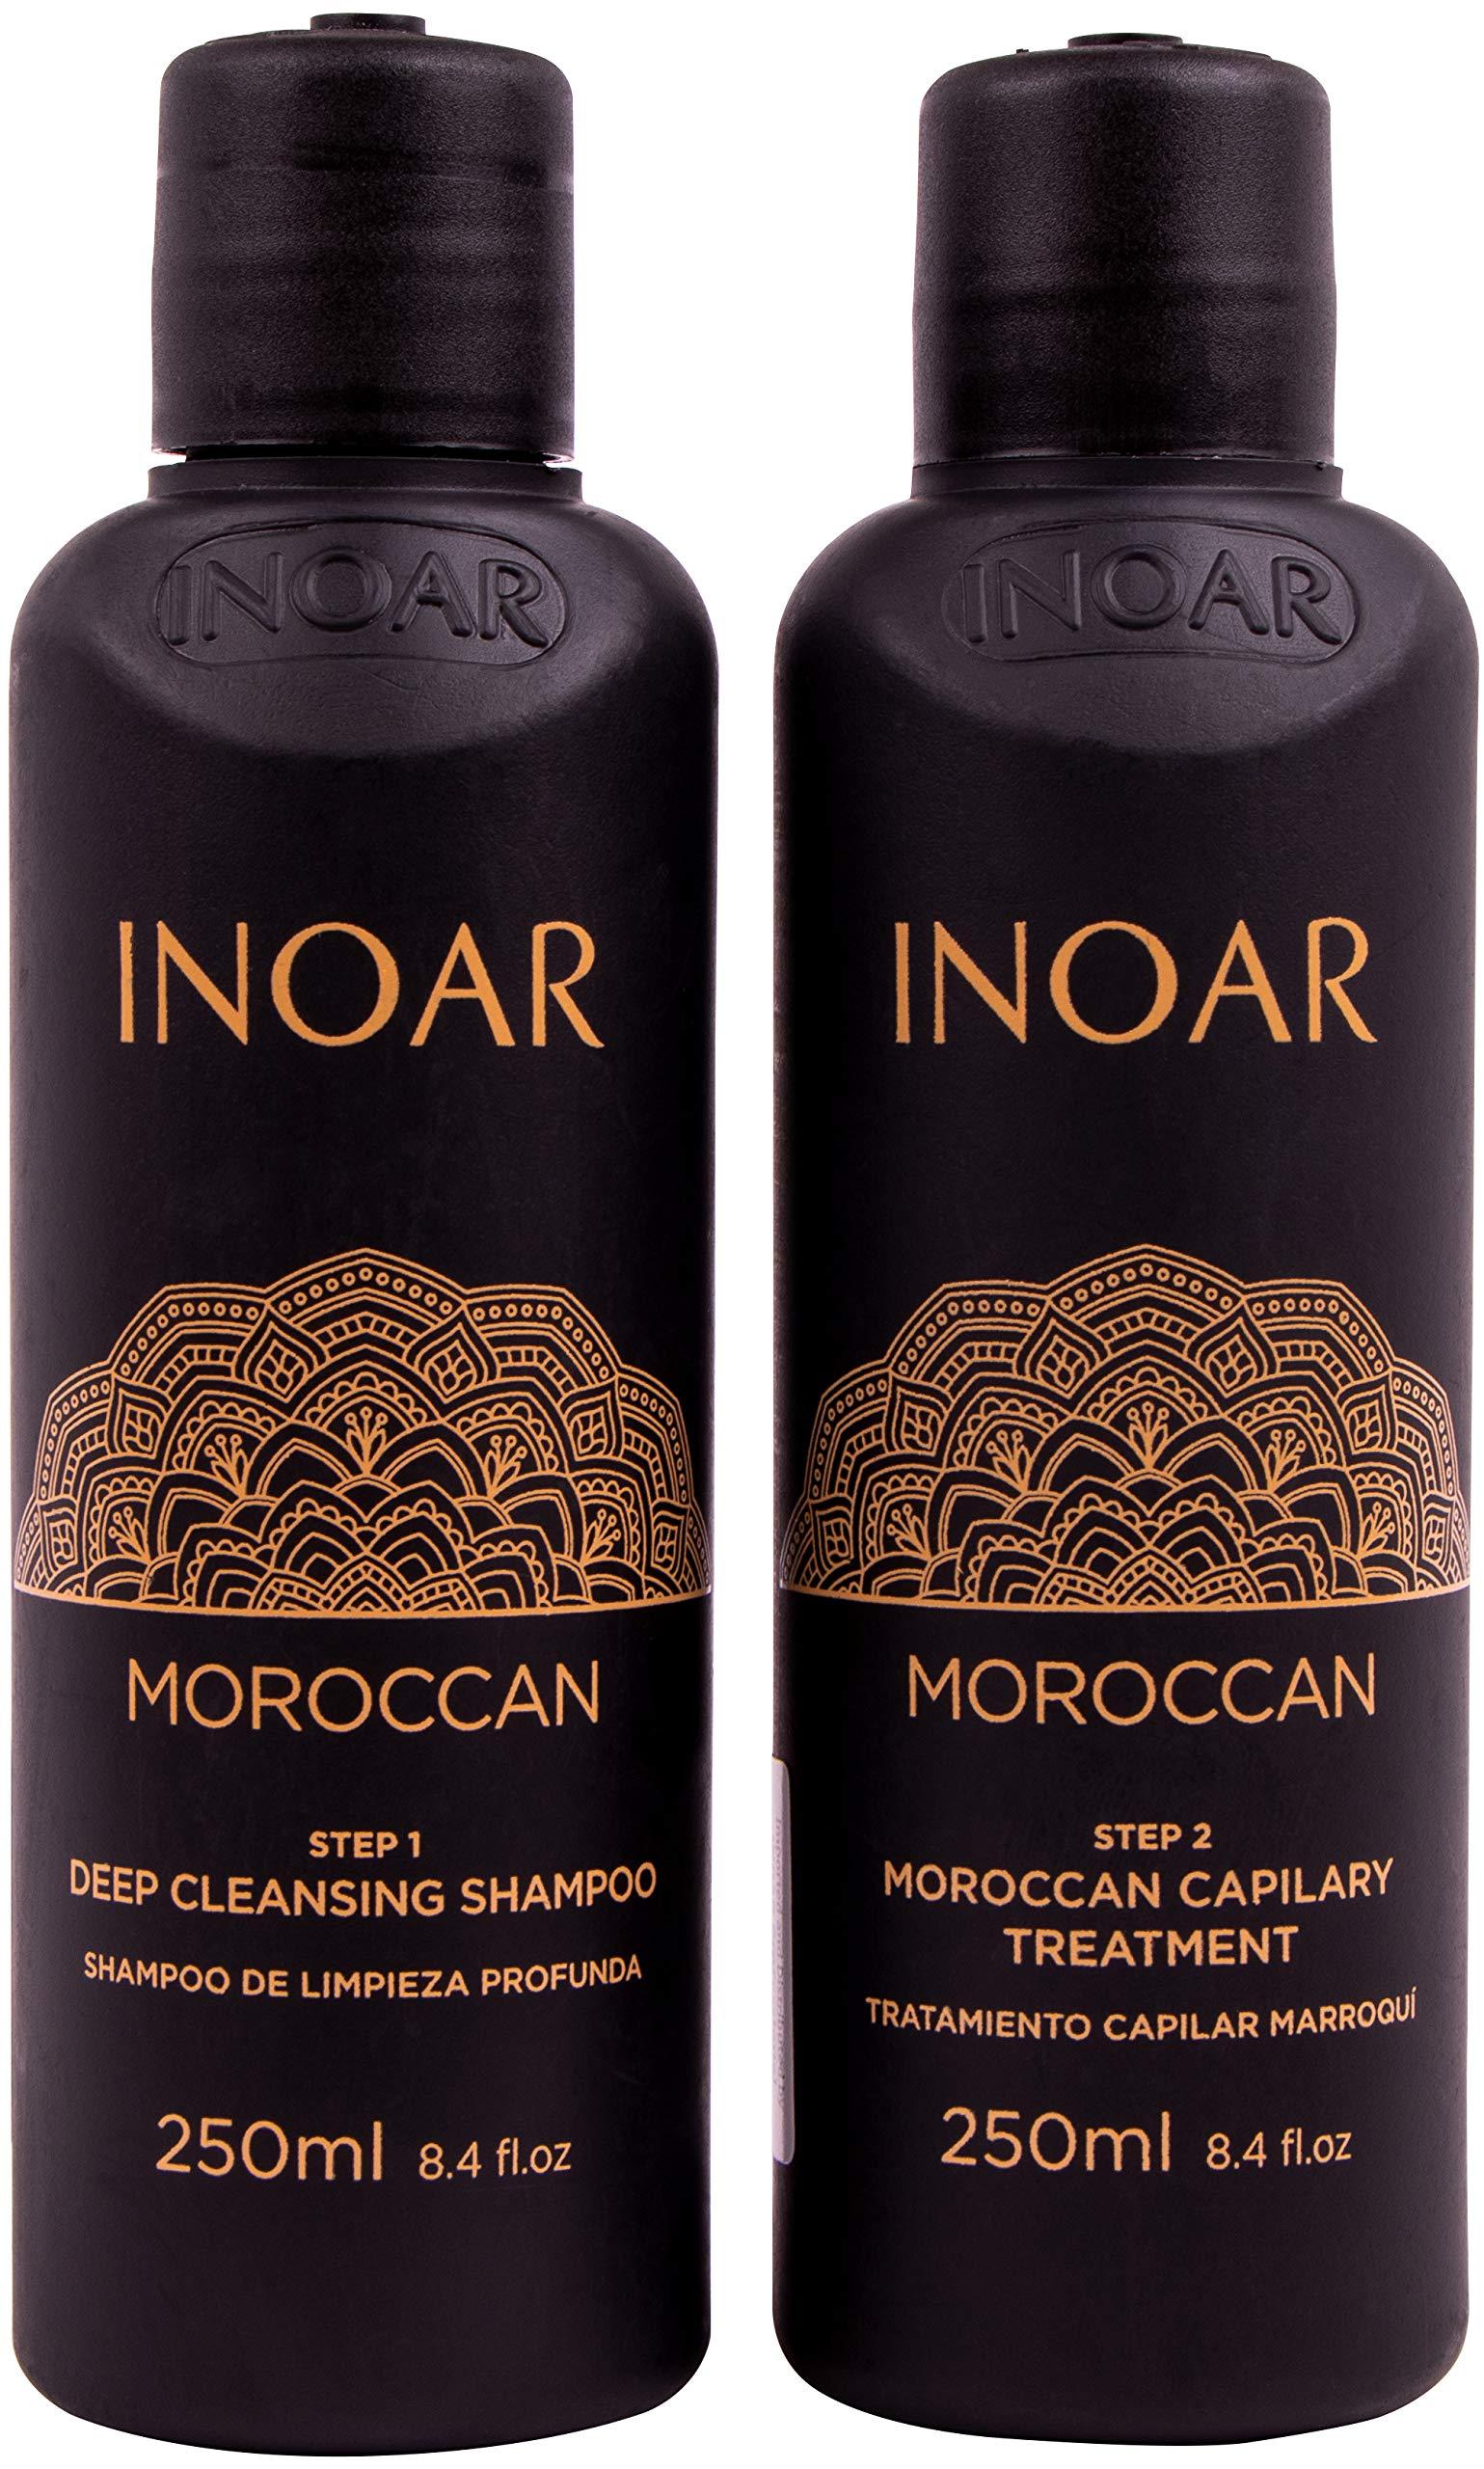 Inoar Moroccan Brazilian Blowout Keratin Kit, 33.8oz/250ml